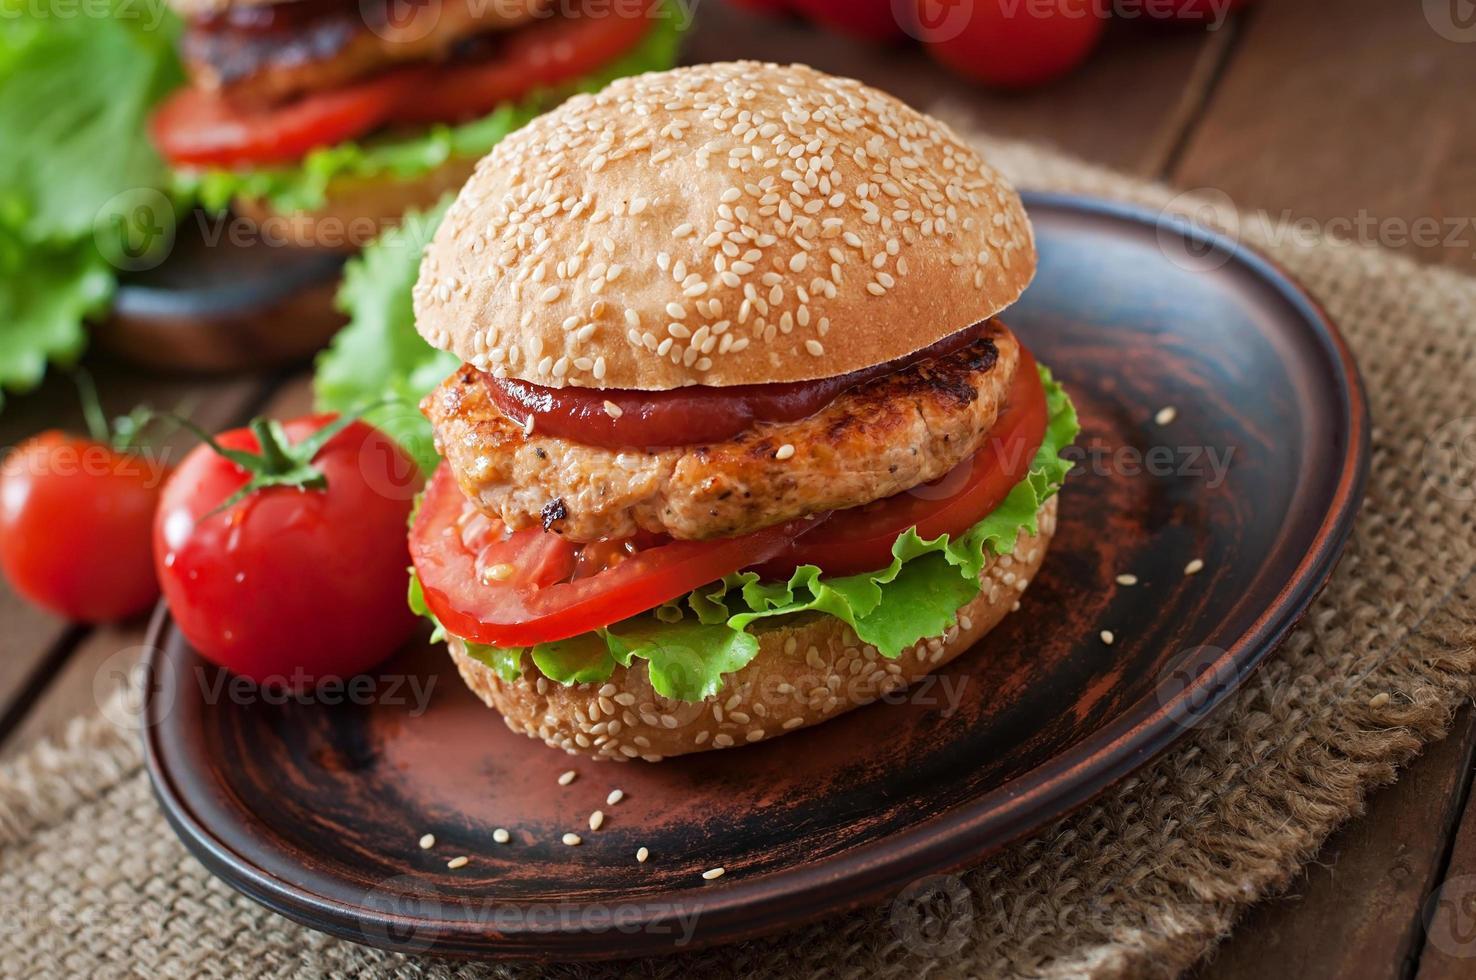 sanduíche com hambúrguer de frango, tomate e alface foto